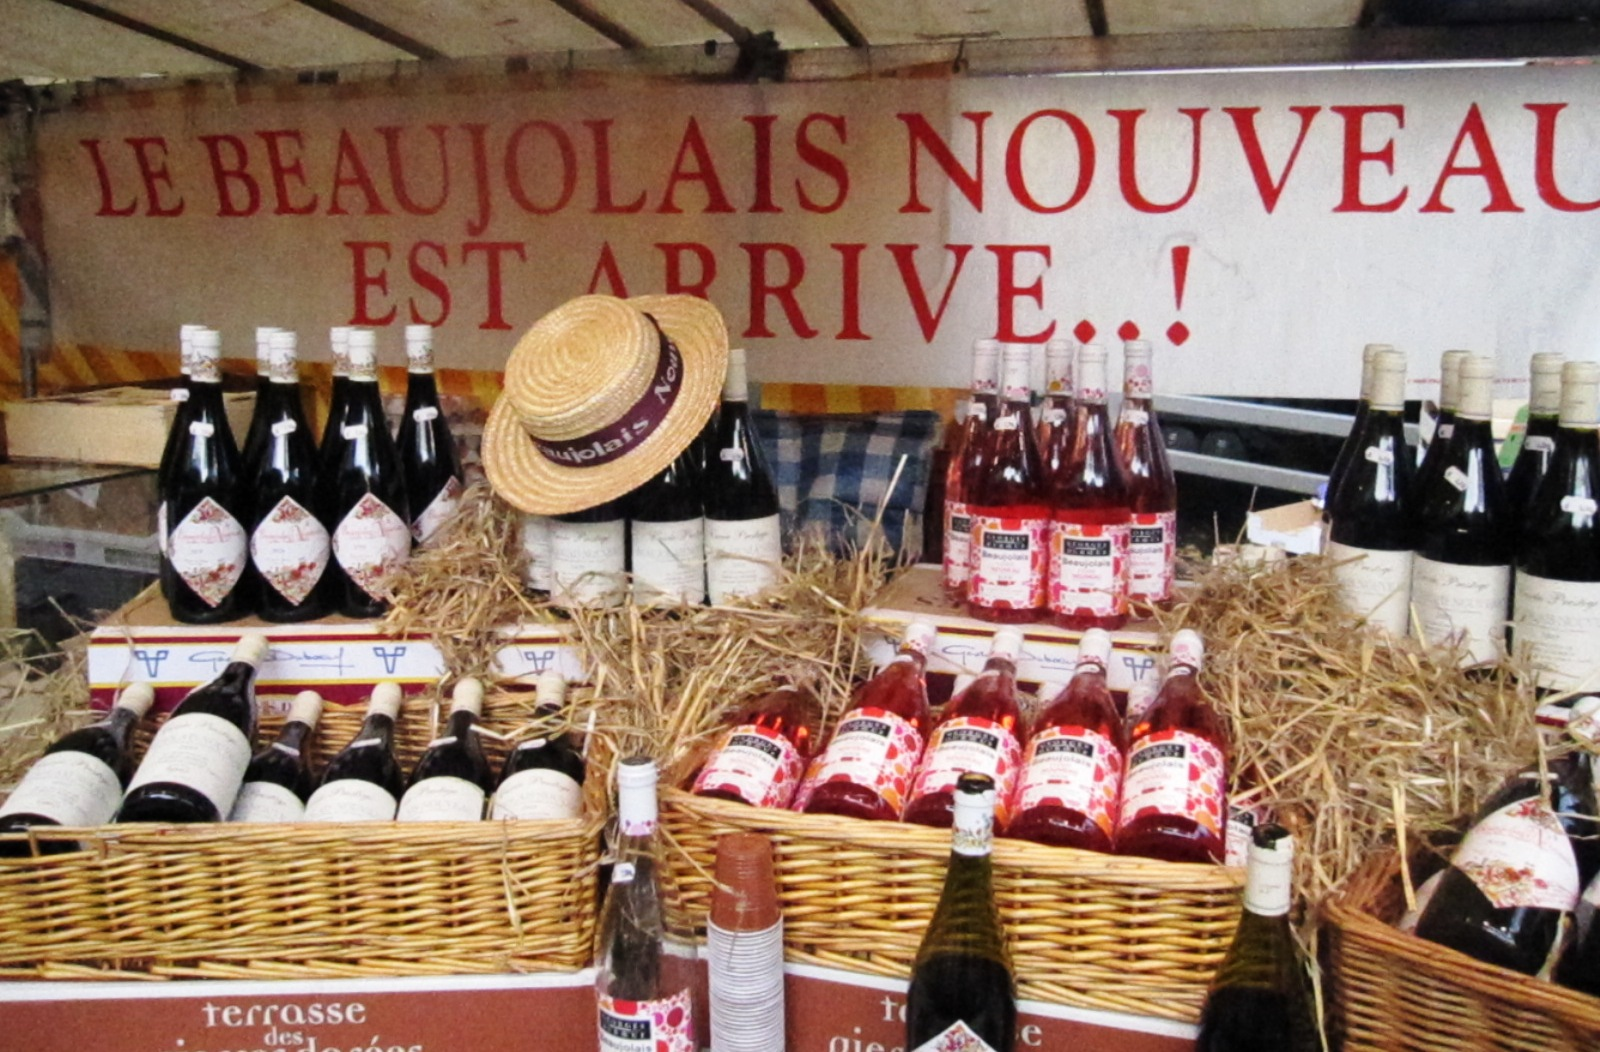 праздник вина во Франции